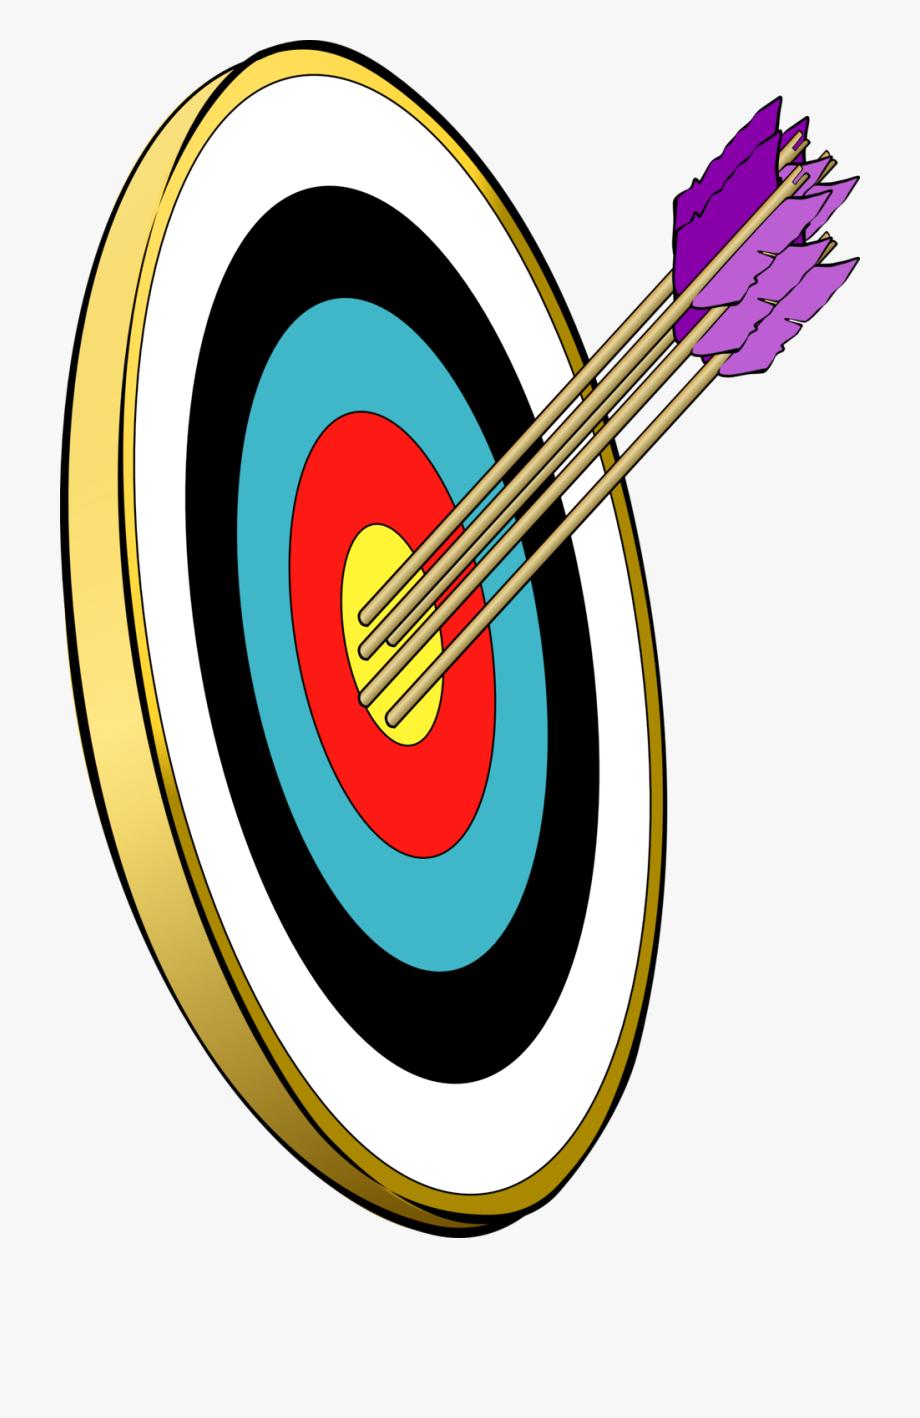 Archery clipart archery range. Target arrow shooting free